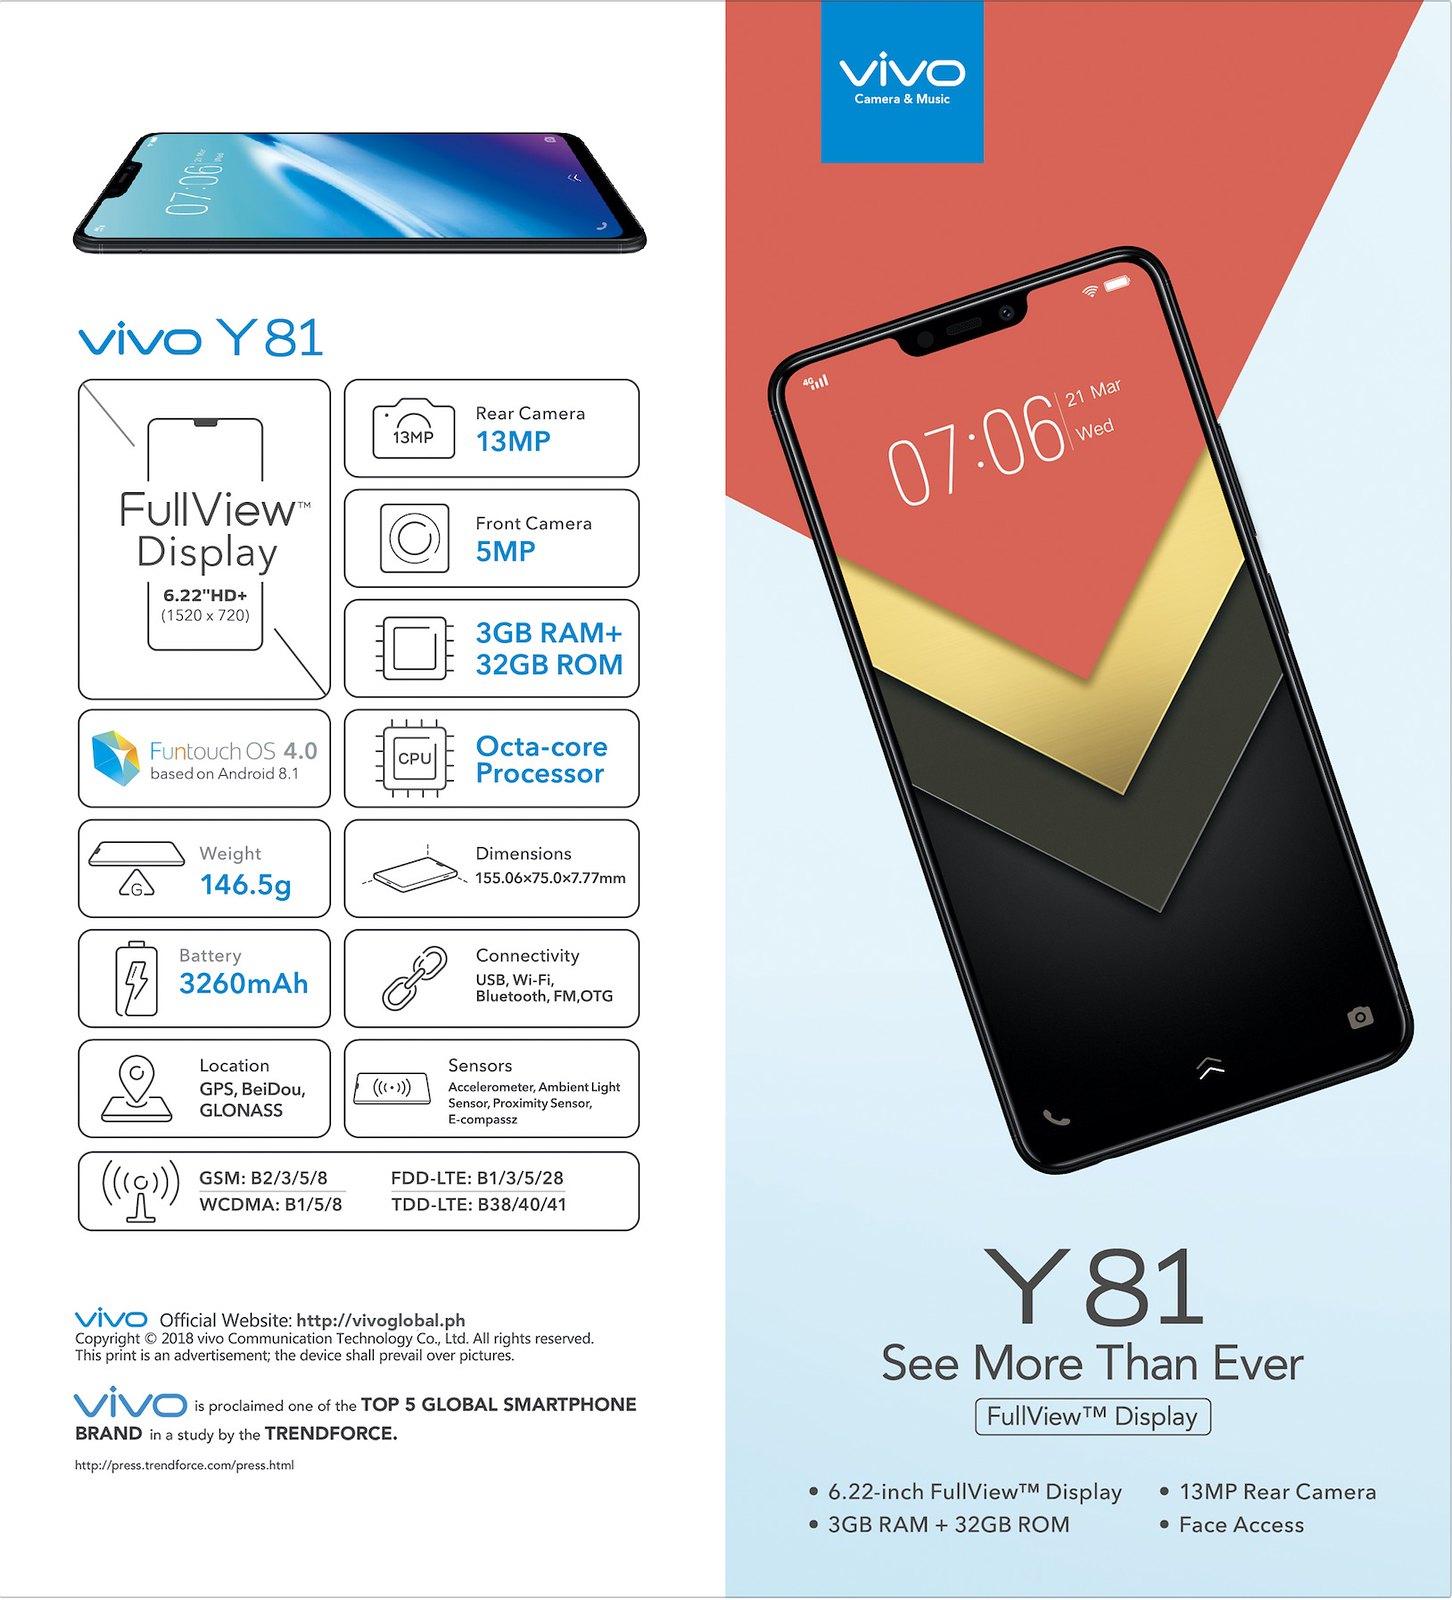 Vivo Y81 Philippines Price